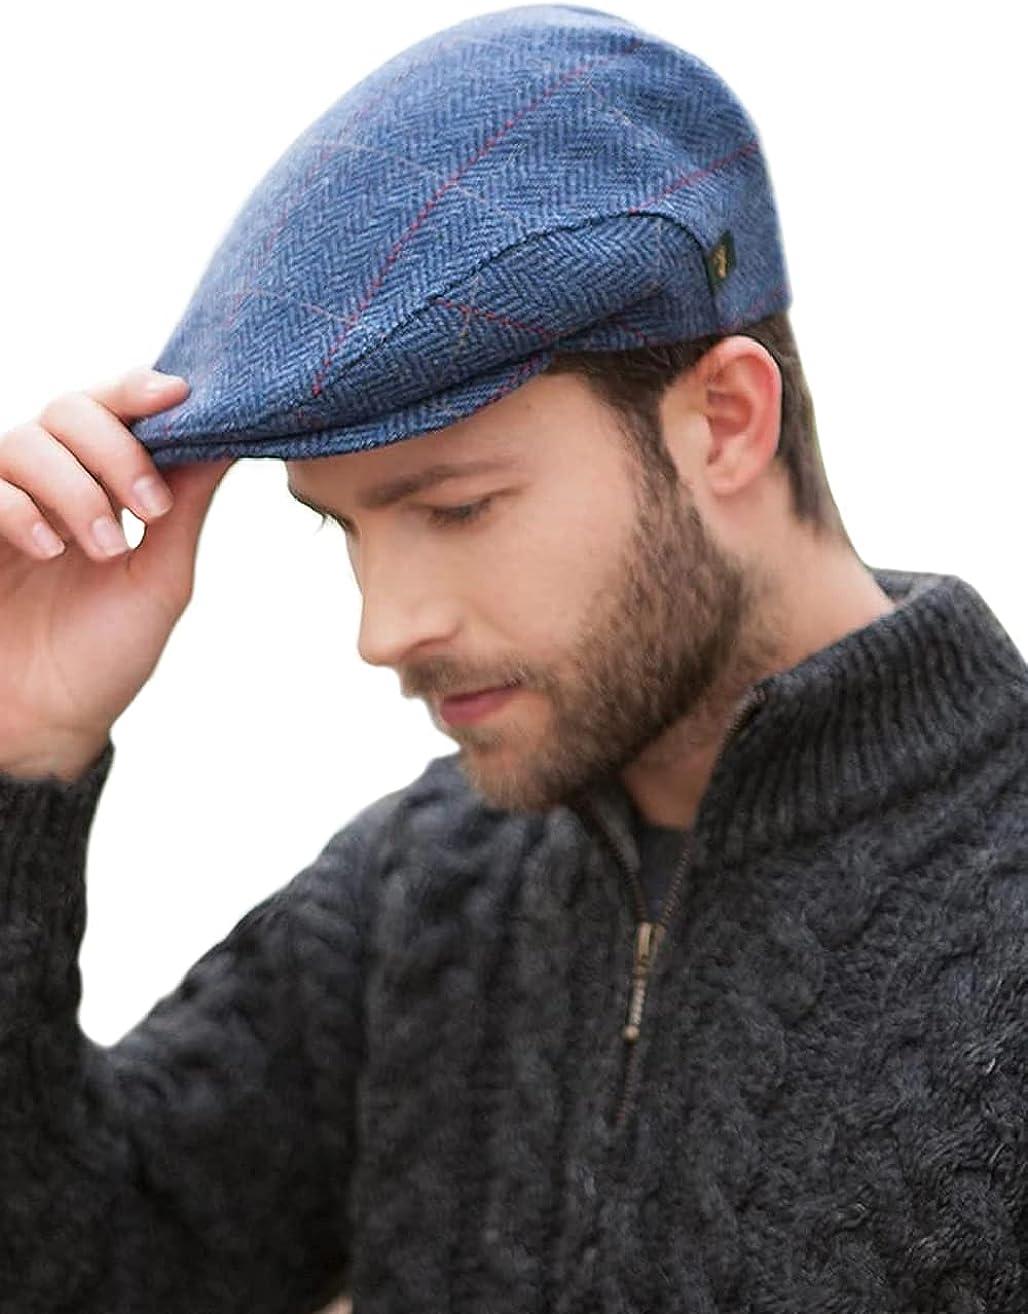 Mucros Weavers Irish Flat Cap Men Trinity Tweed Hat Driving Cap Made in Ireland